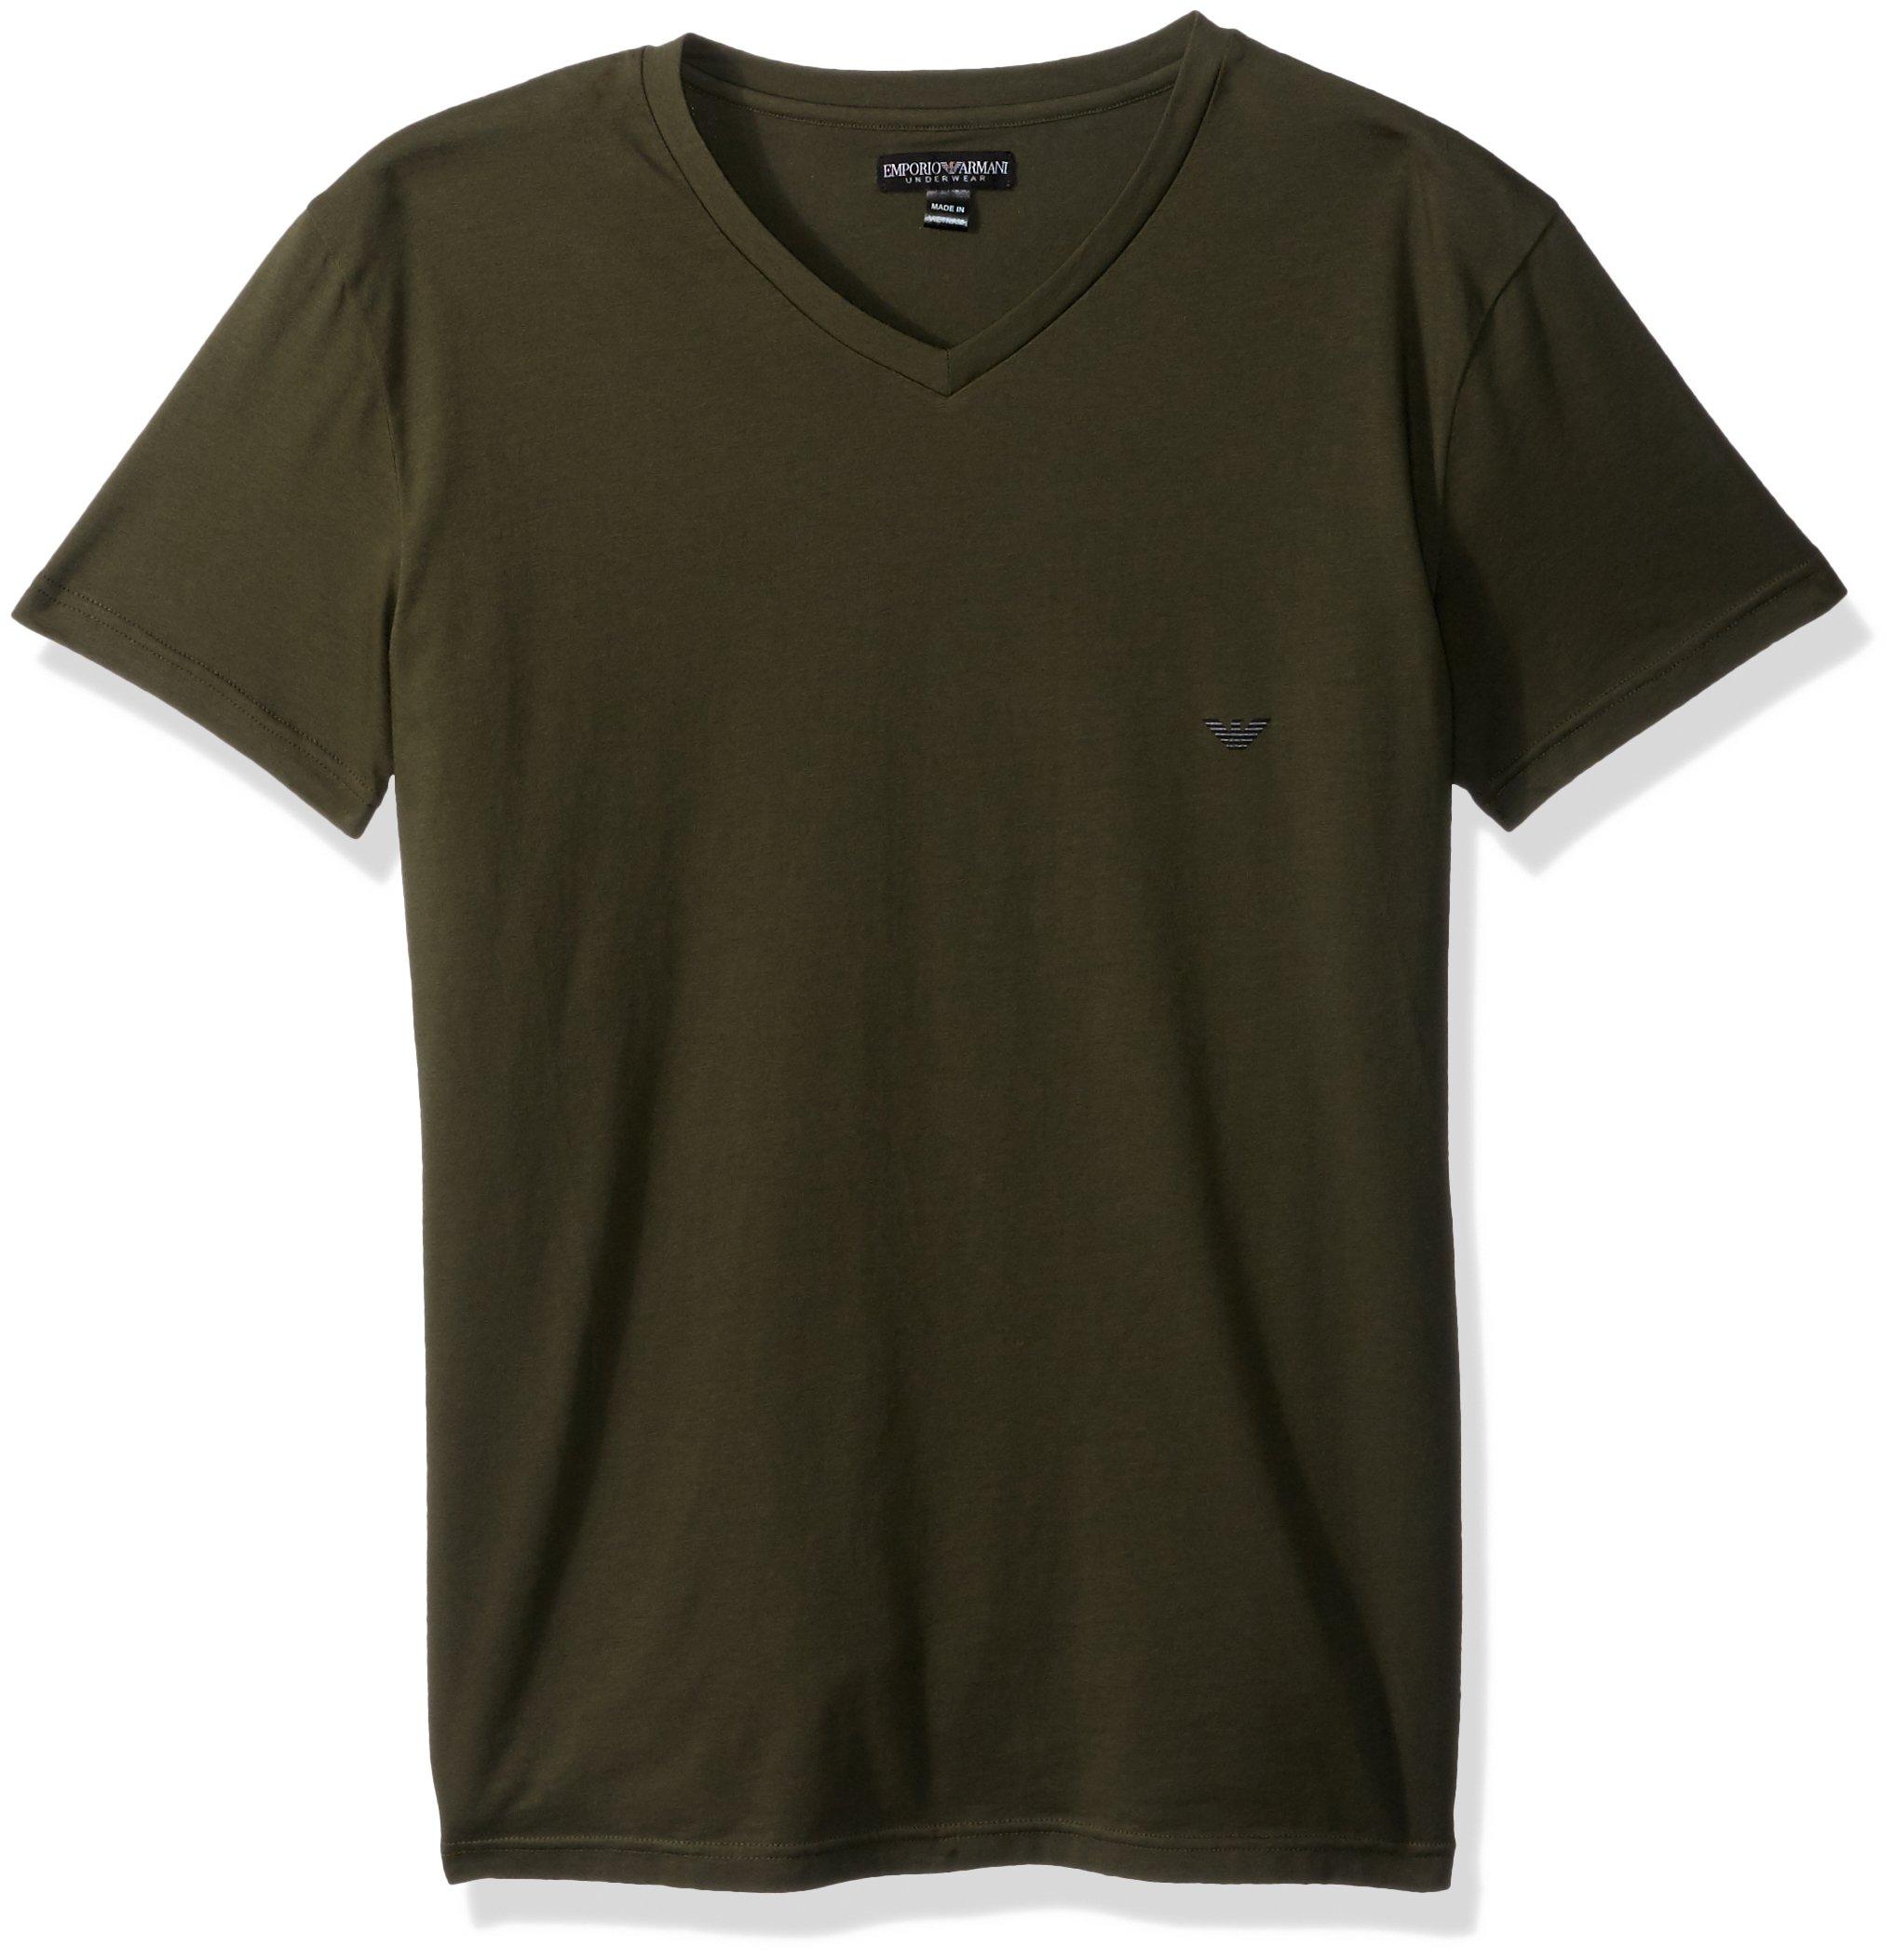 Emporio Armani Men's Iconic Logoband V-Neck, Military, XL